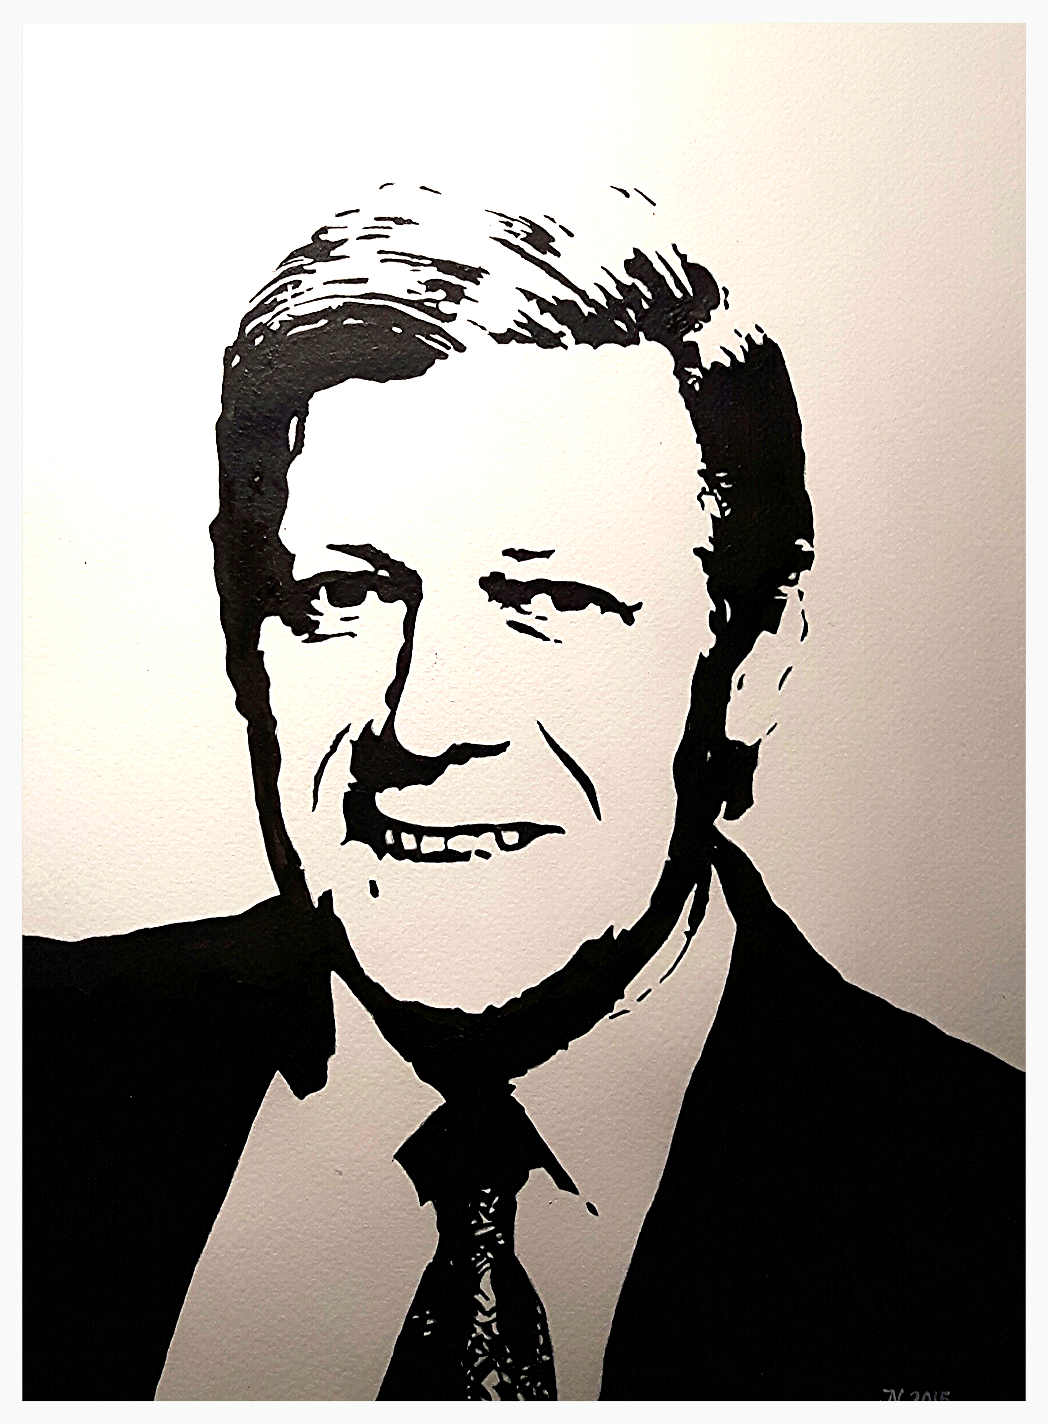 Helmut Schmidt